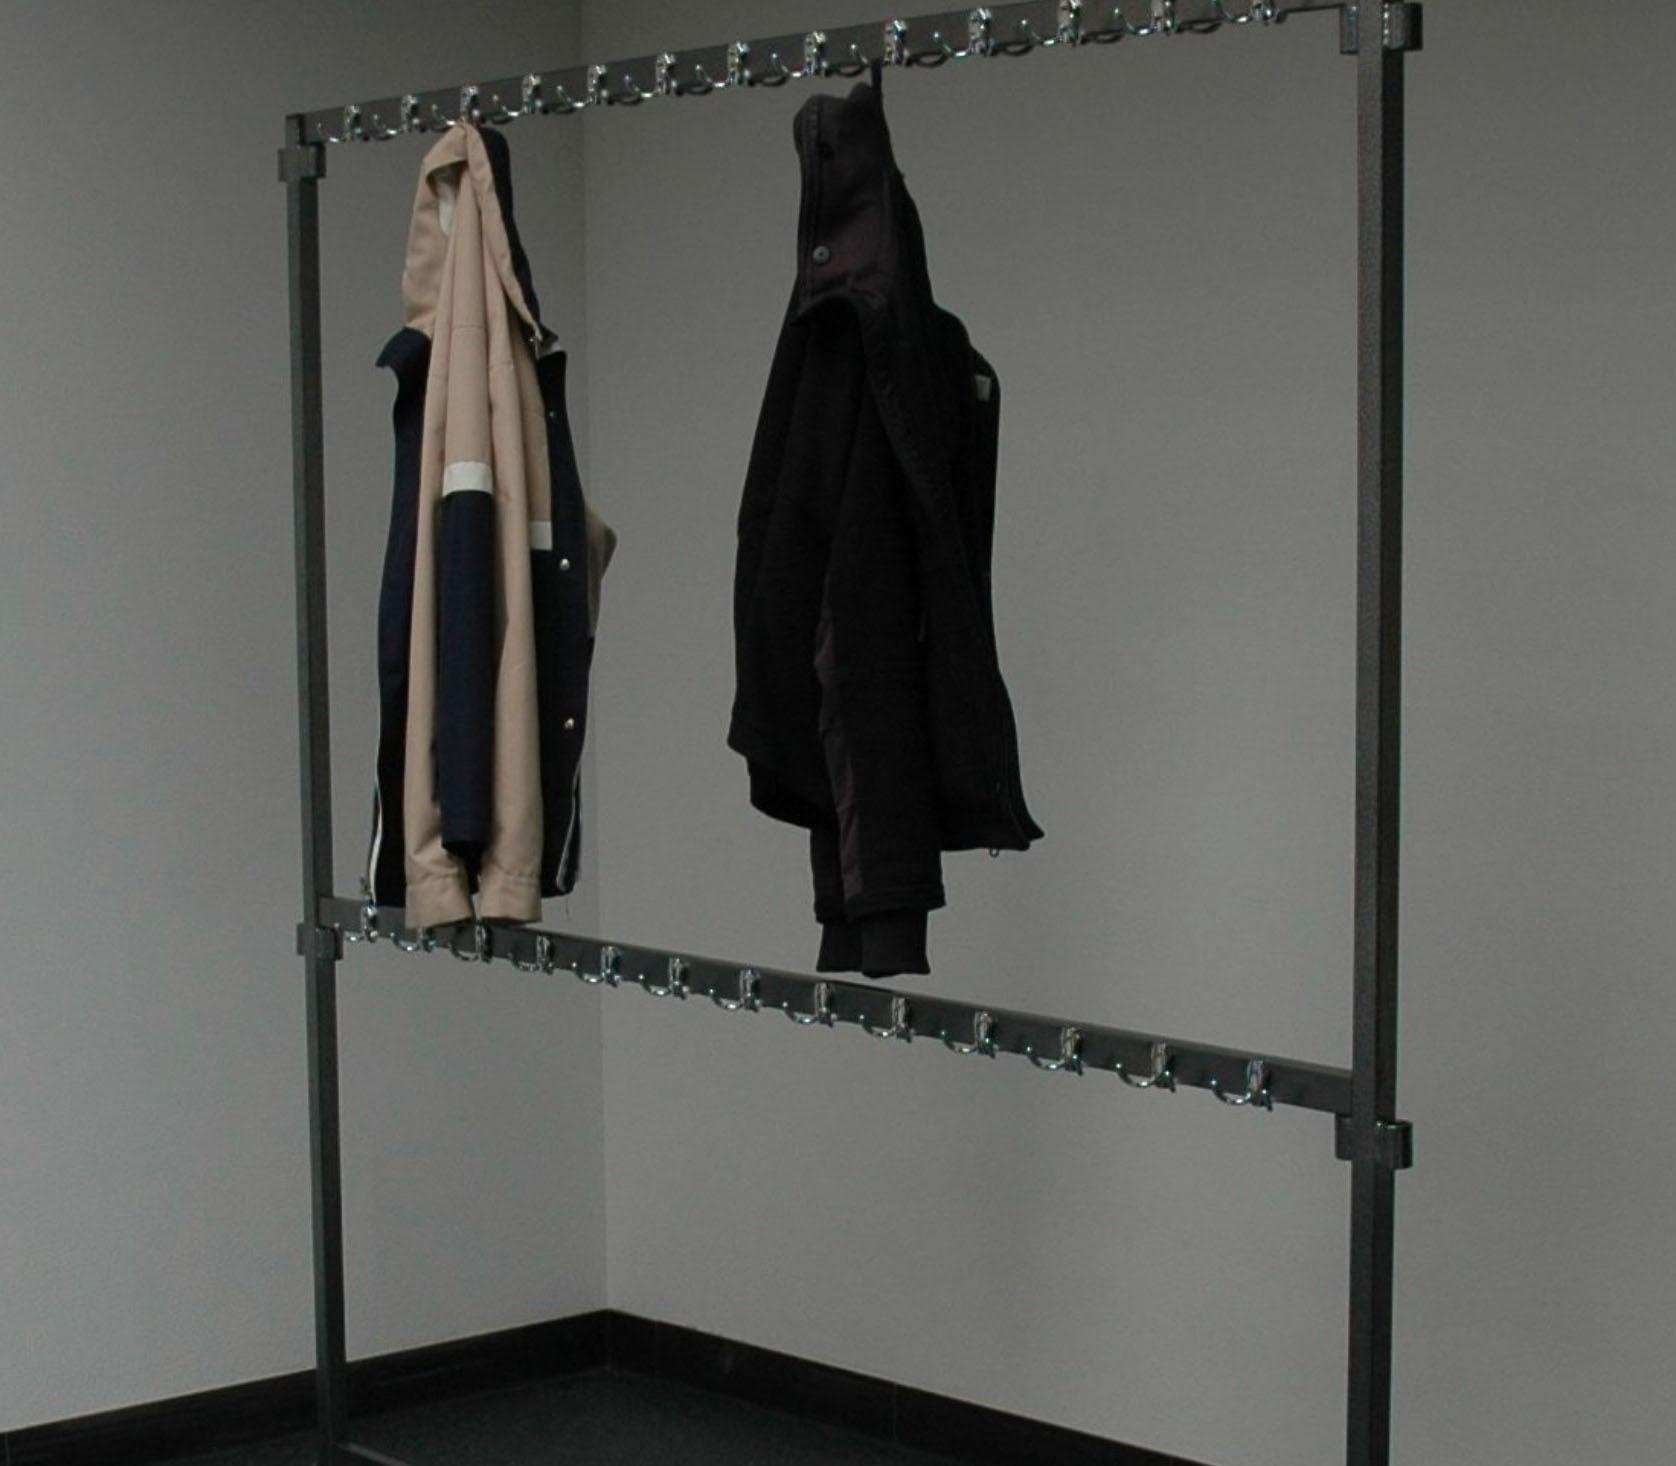 garderobe-4